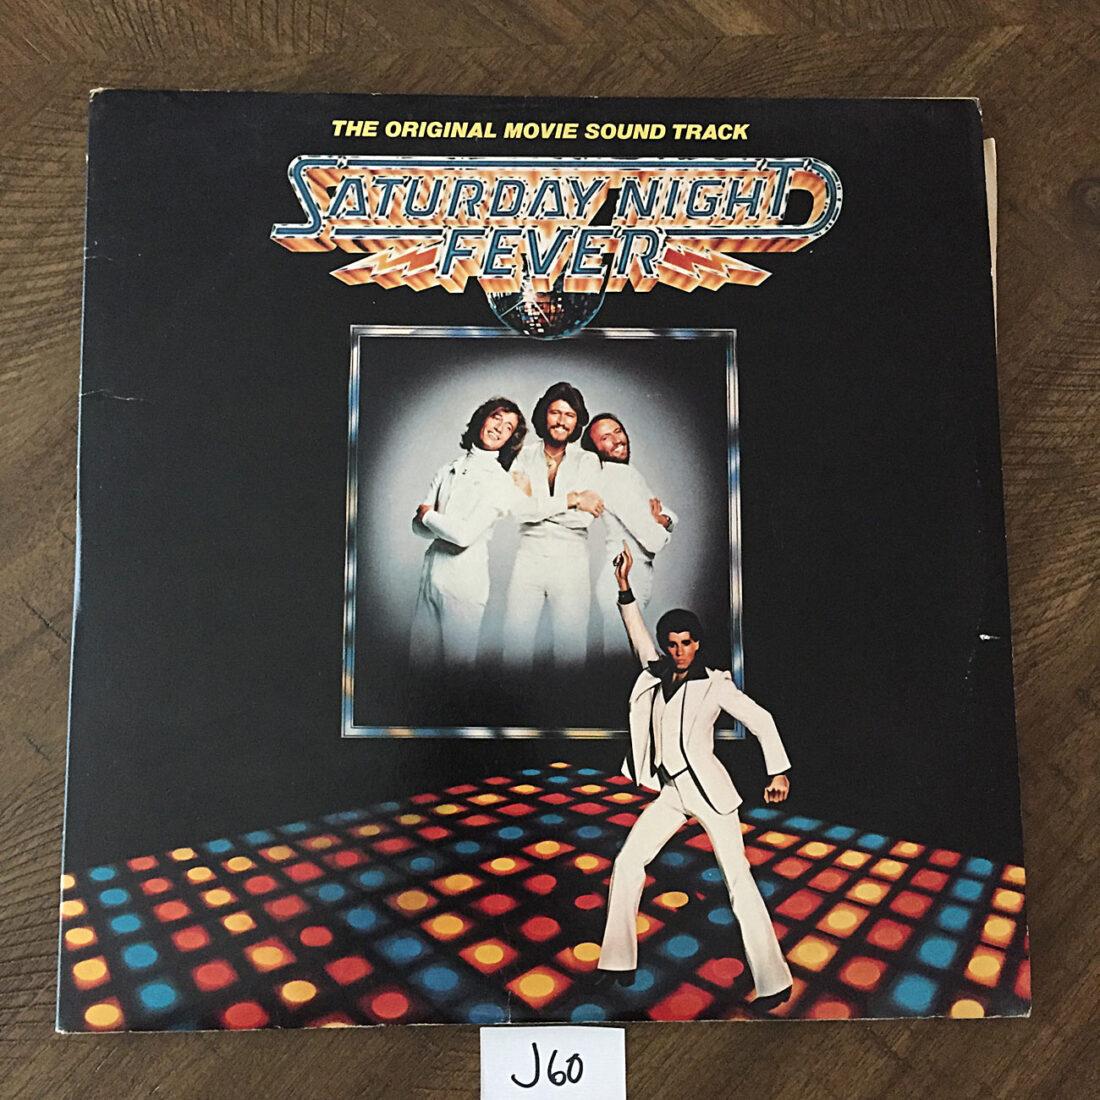 Saturday Night Fever The Original Movie Soundtrack 2-LP Vinyl Edition (1977) [J60]